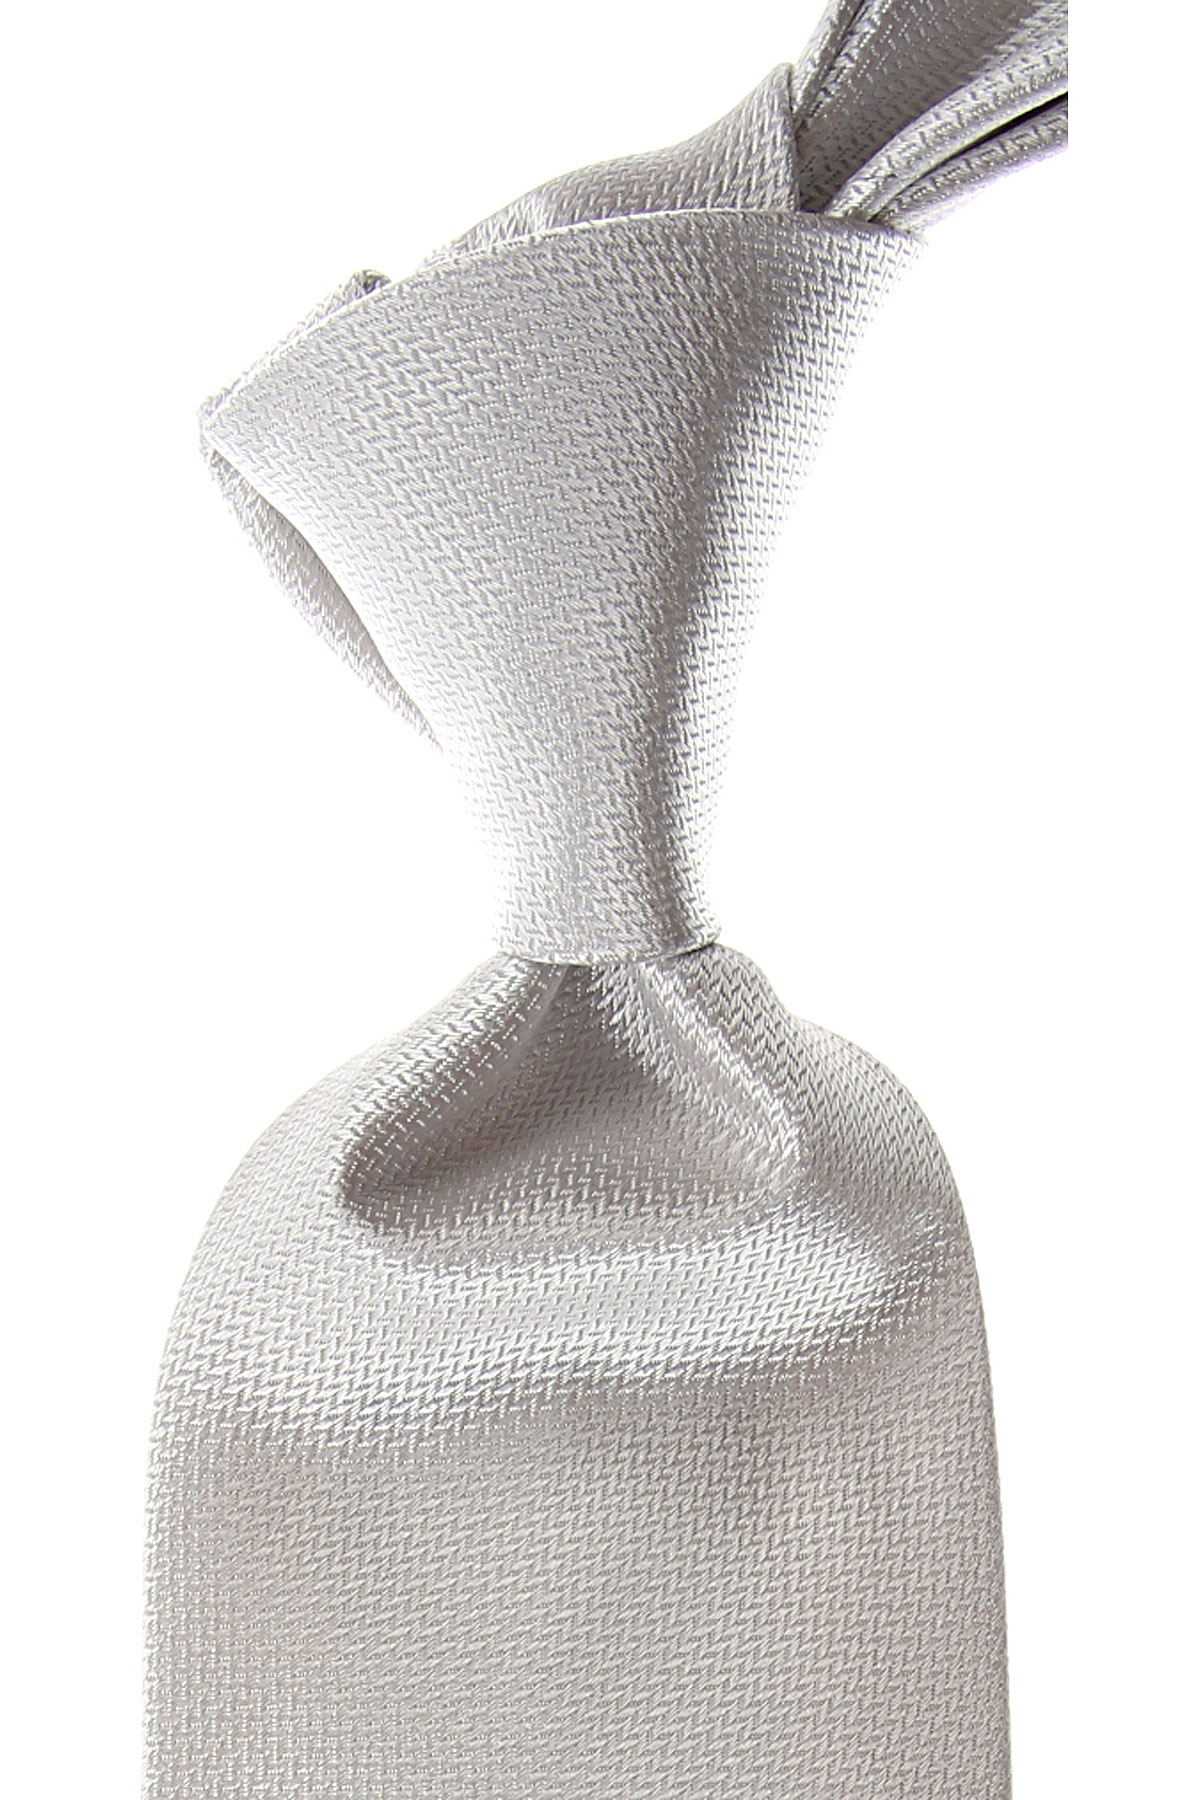 Brioni Ties On Sale, Antique White, Silk, 2019